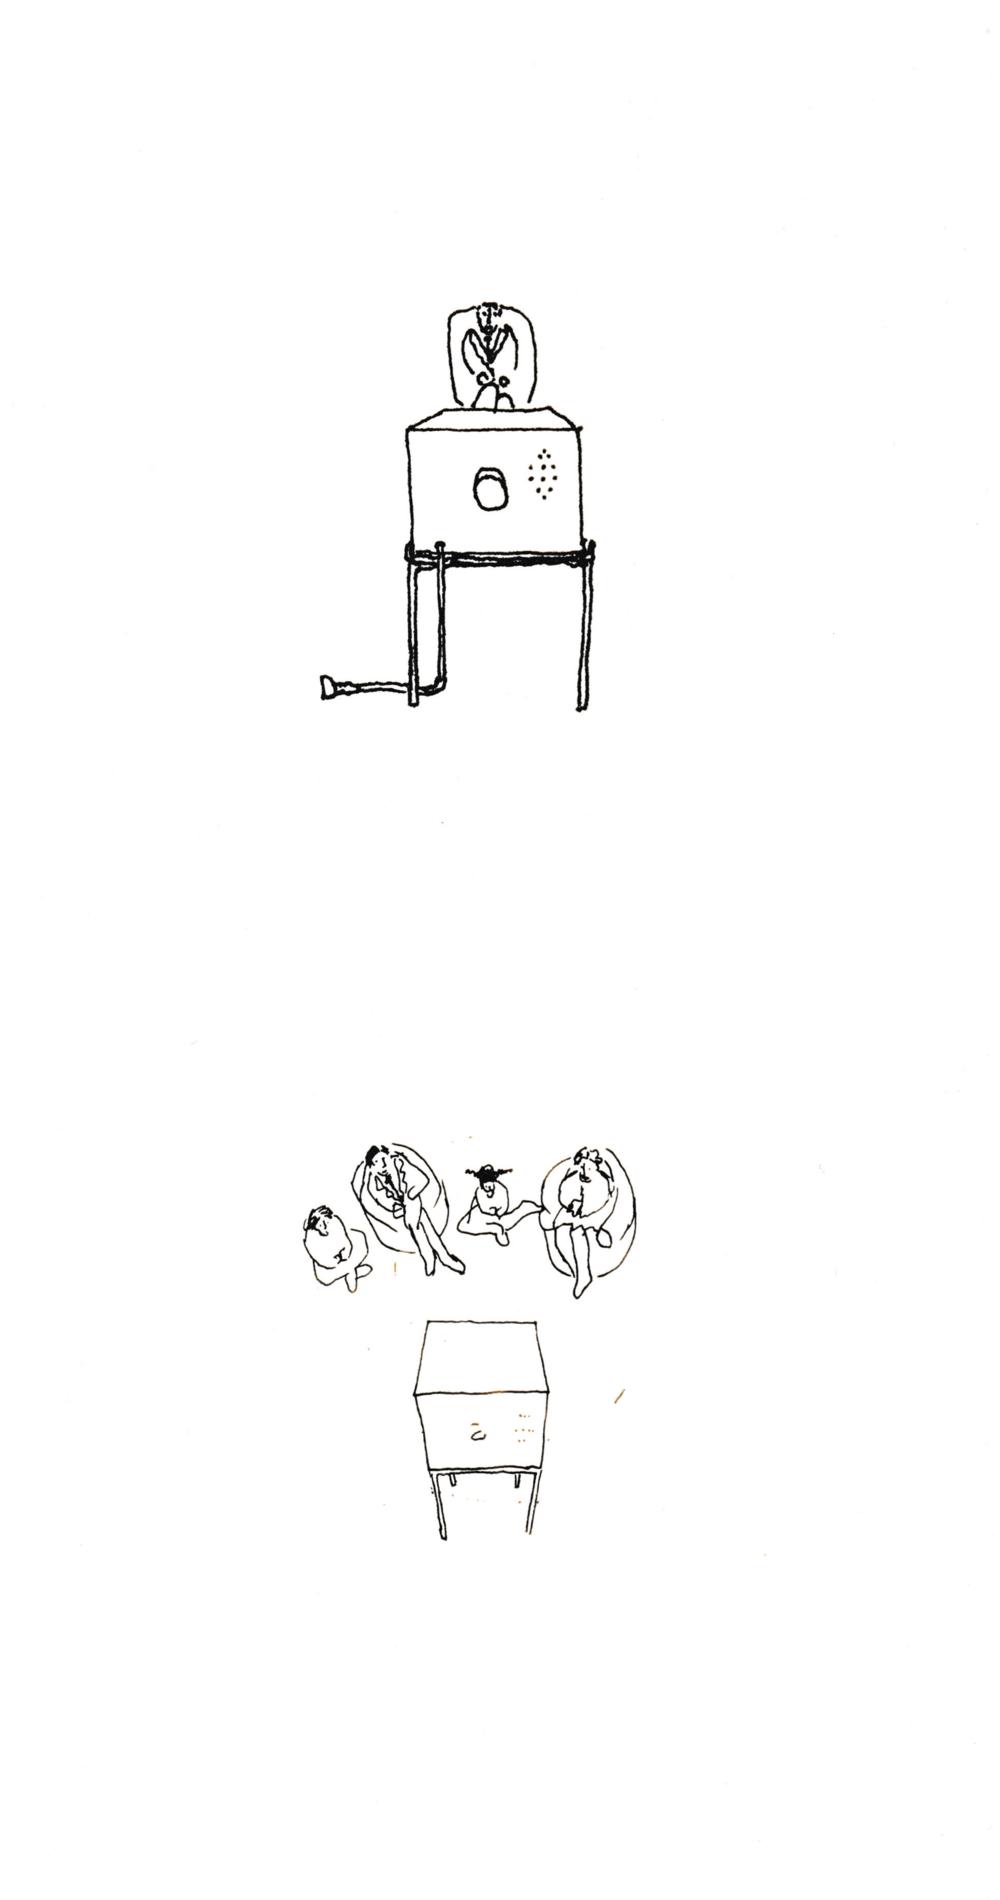 ManAtTVandFamilyAroundTV_Drawing.png